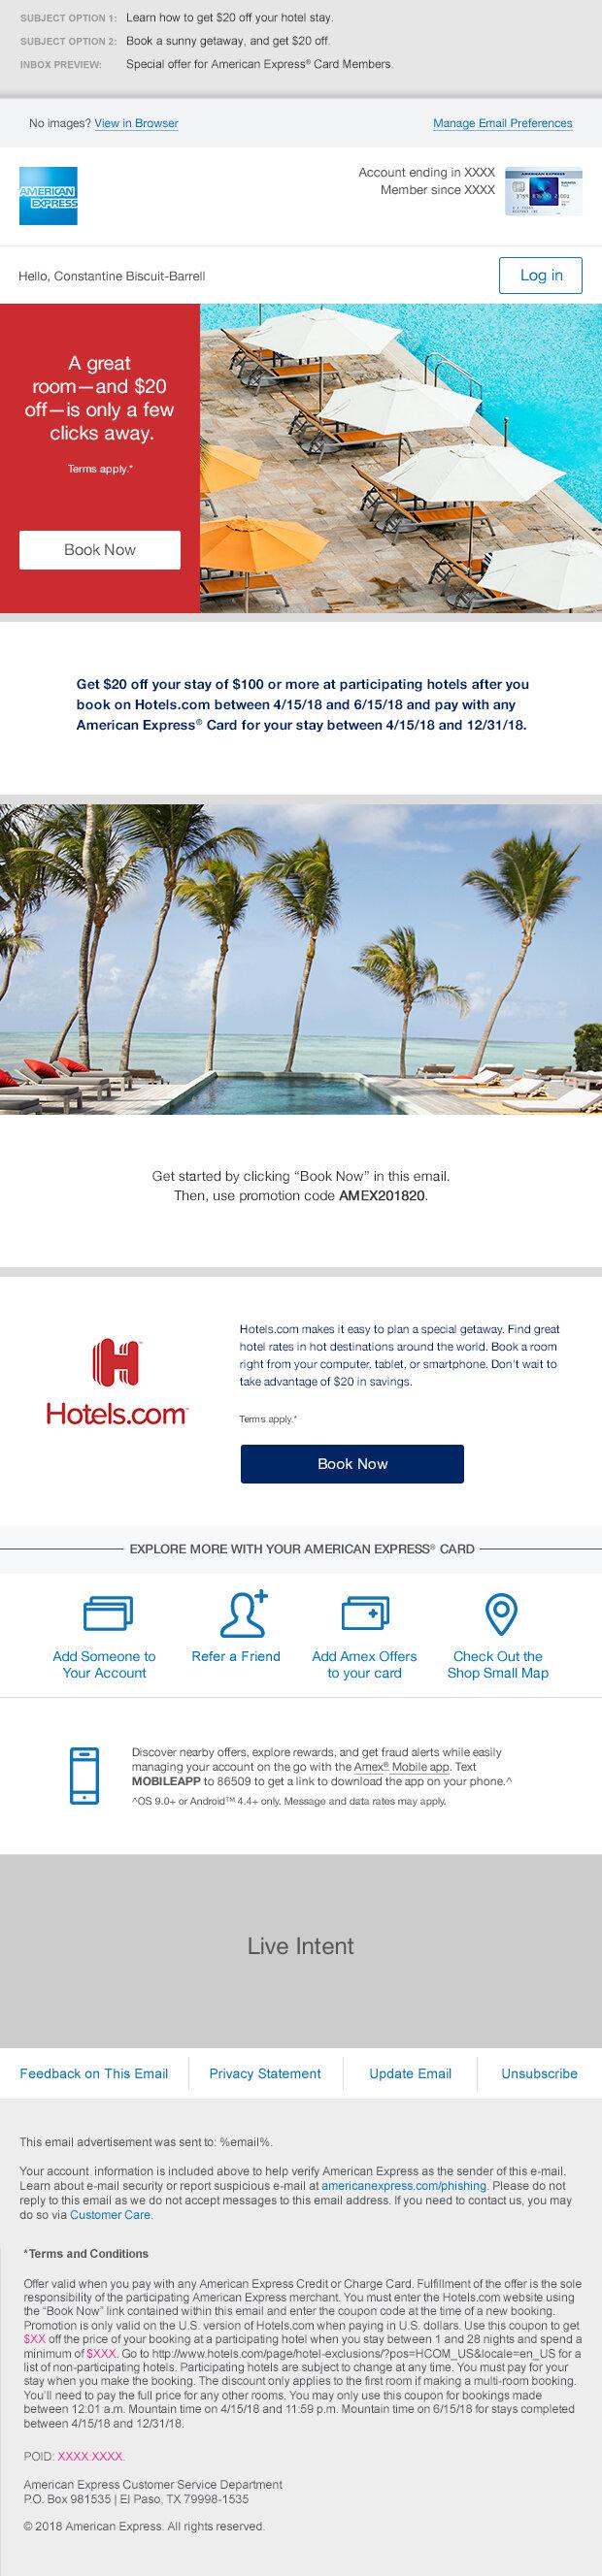 Hotels.com_Existing Customers Offer Email_7708_VShell2.jpg